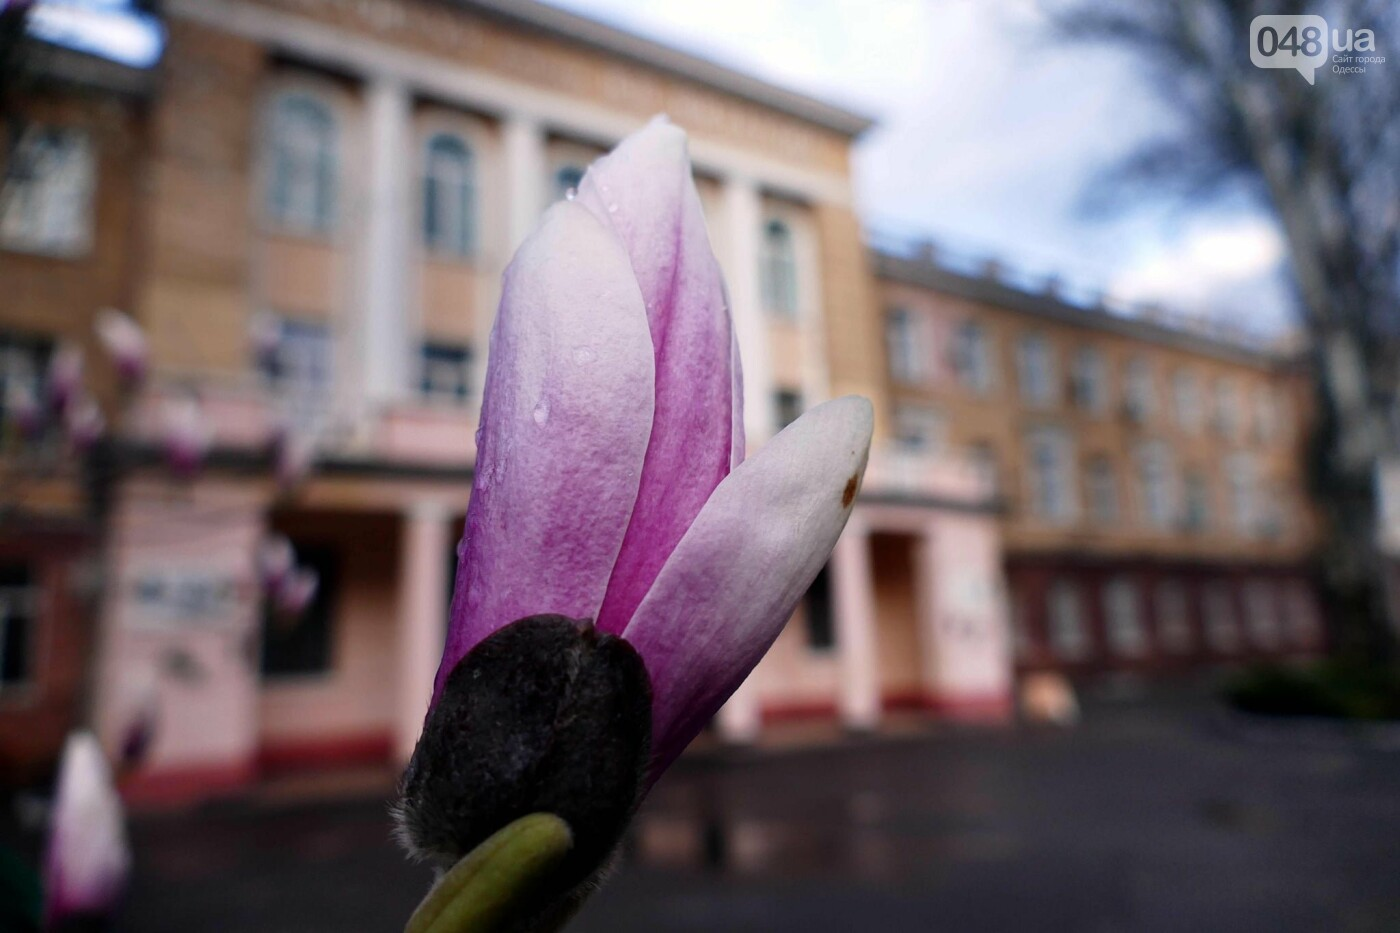 В Одессе начали цвести магнолии,- ФОТО, фото-7